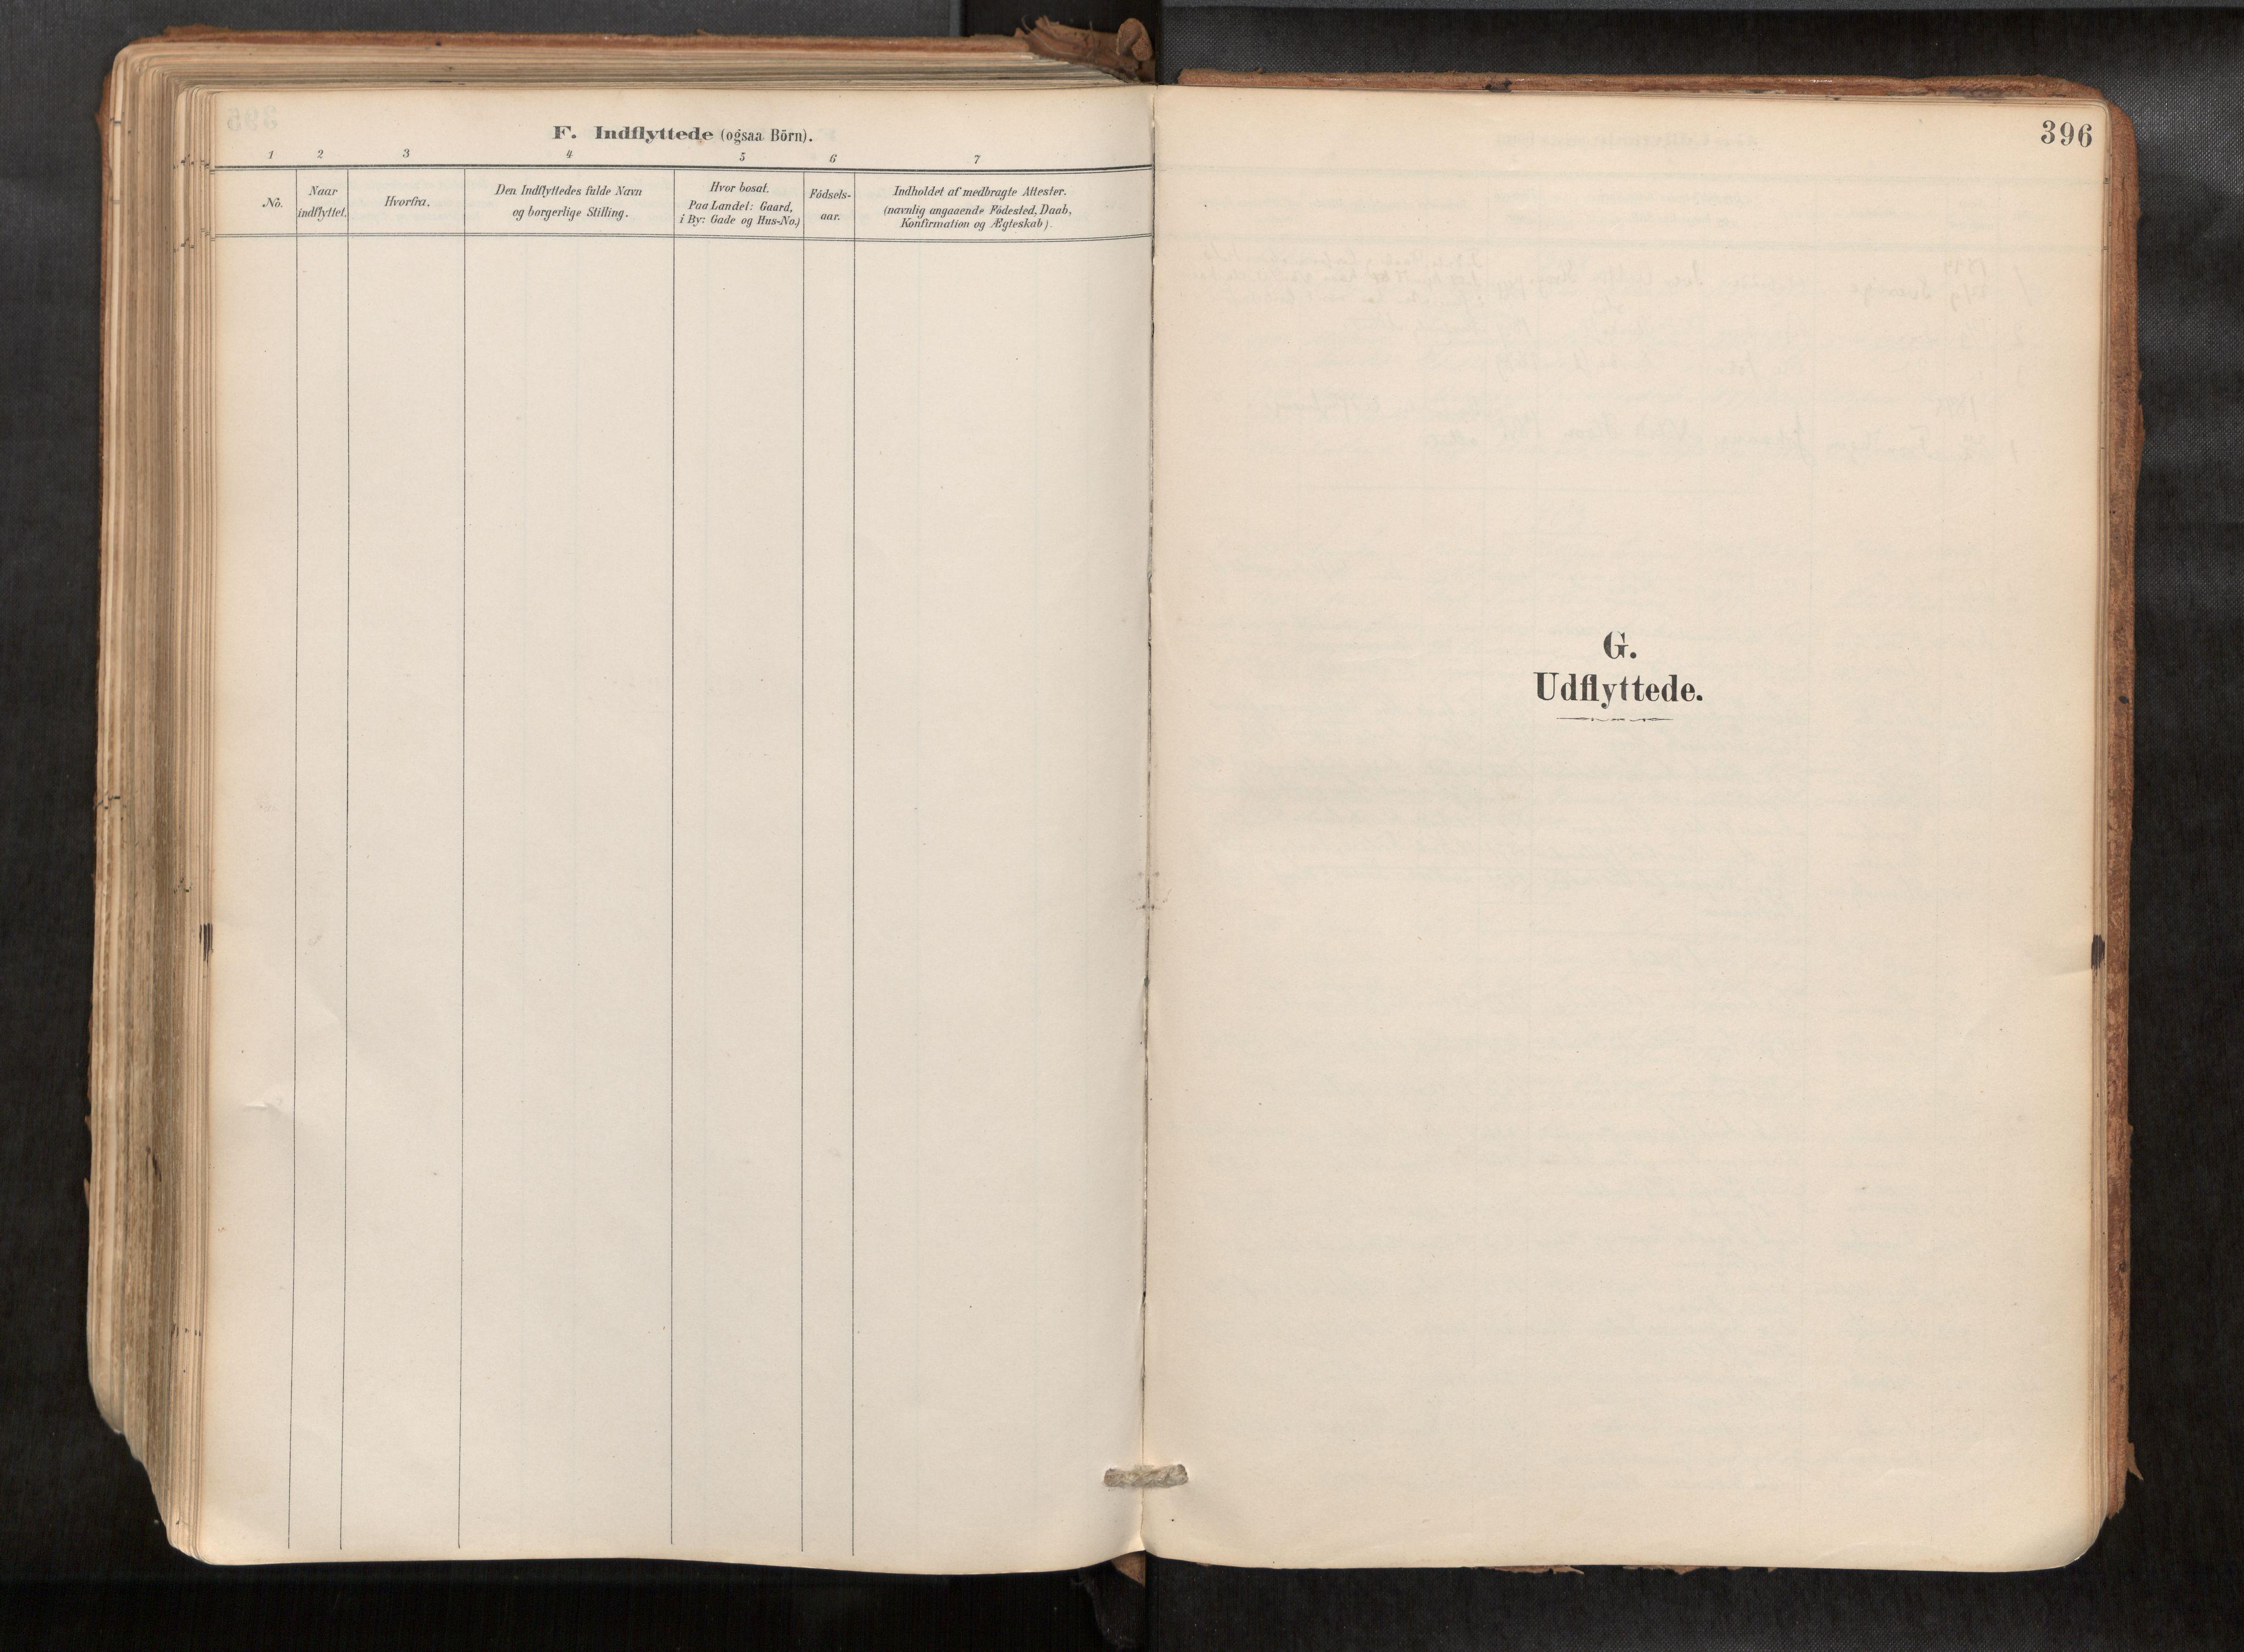 SAT, Ministerialprotokoller, klokkerbøker og fødselsregistre - Sør-Trøndelag, 692/L1105b: Parish register (official) no. 692A06, 1891-1934, p. 396